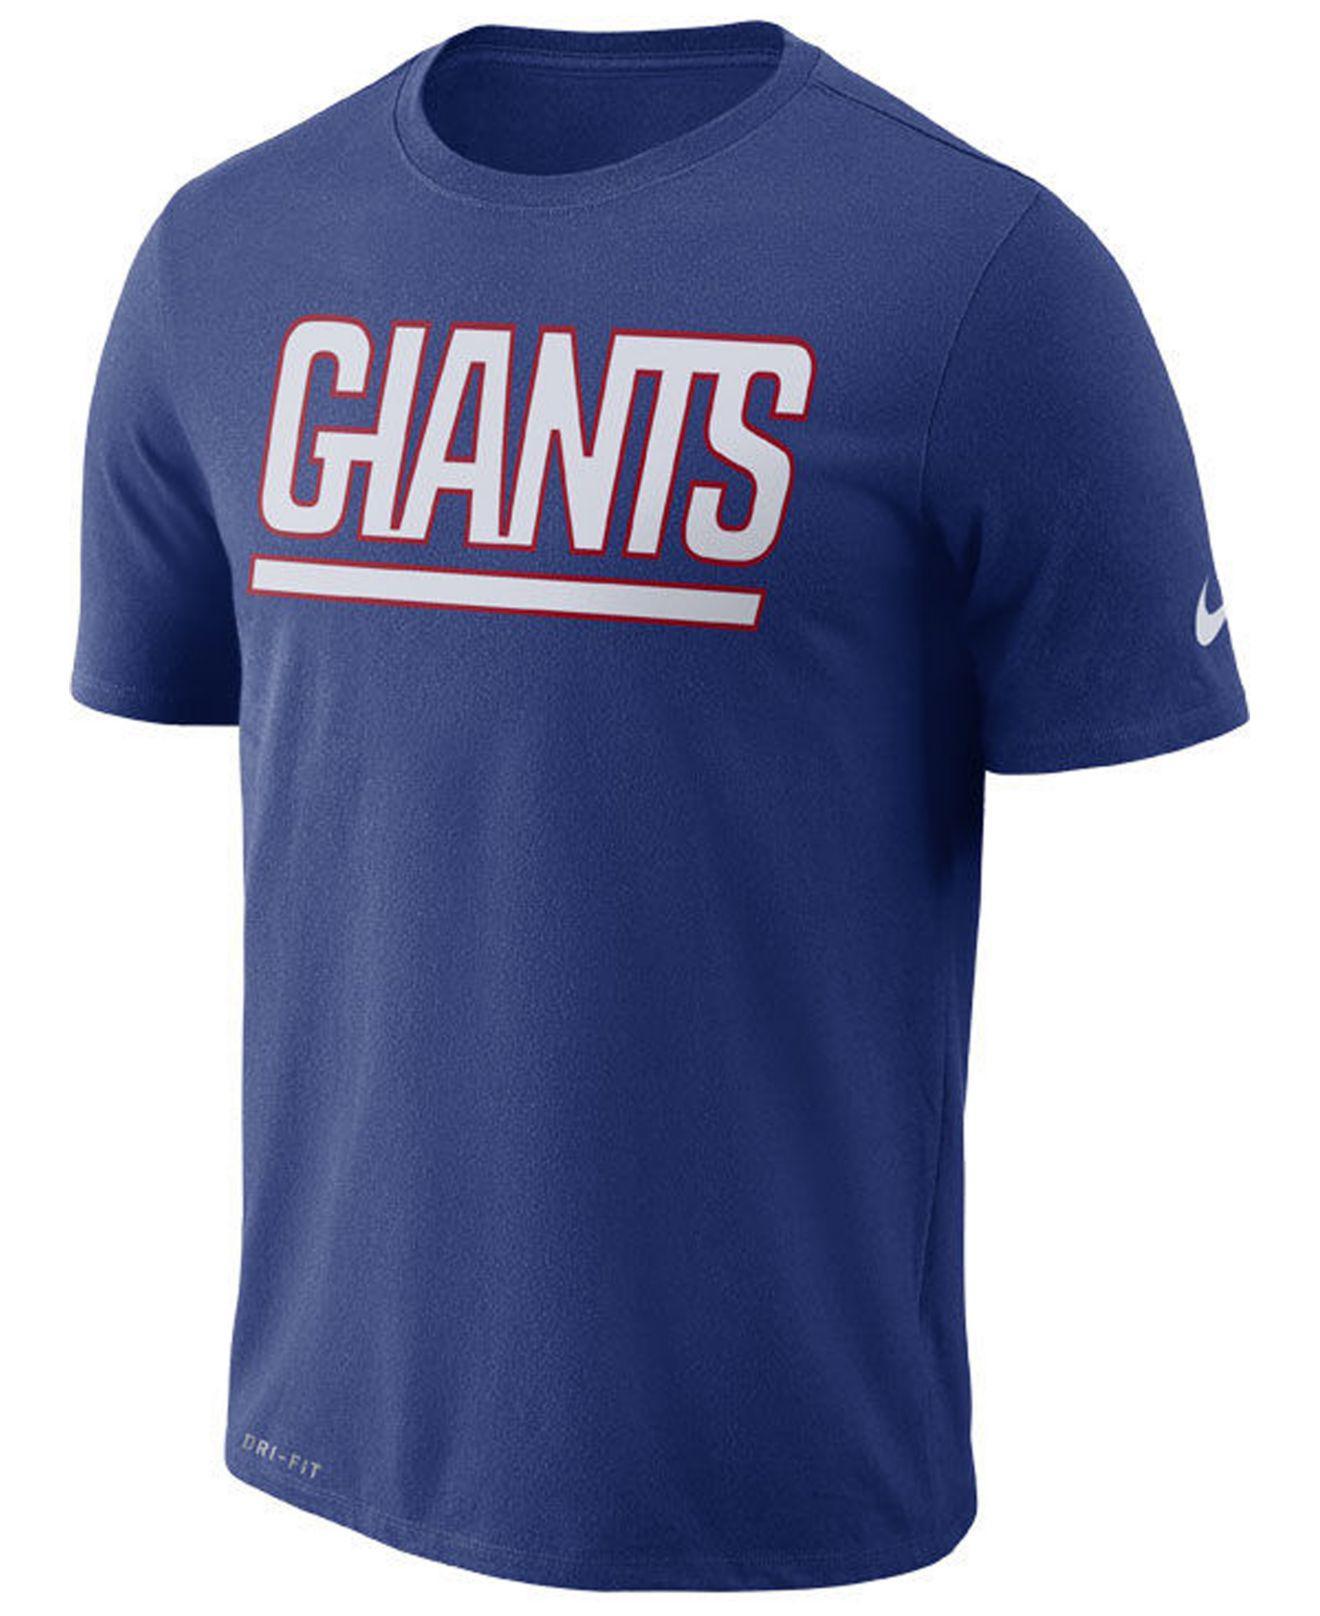 c5b00b0c4 Nike. Men s Blue New York Giants Dri-fit Cotton Essential Wordmark T-shirt